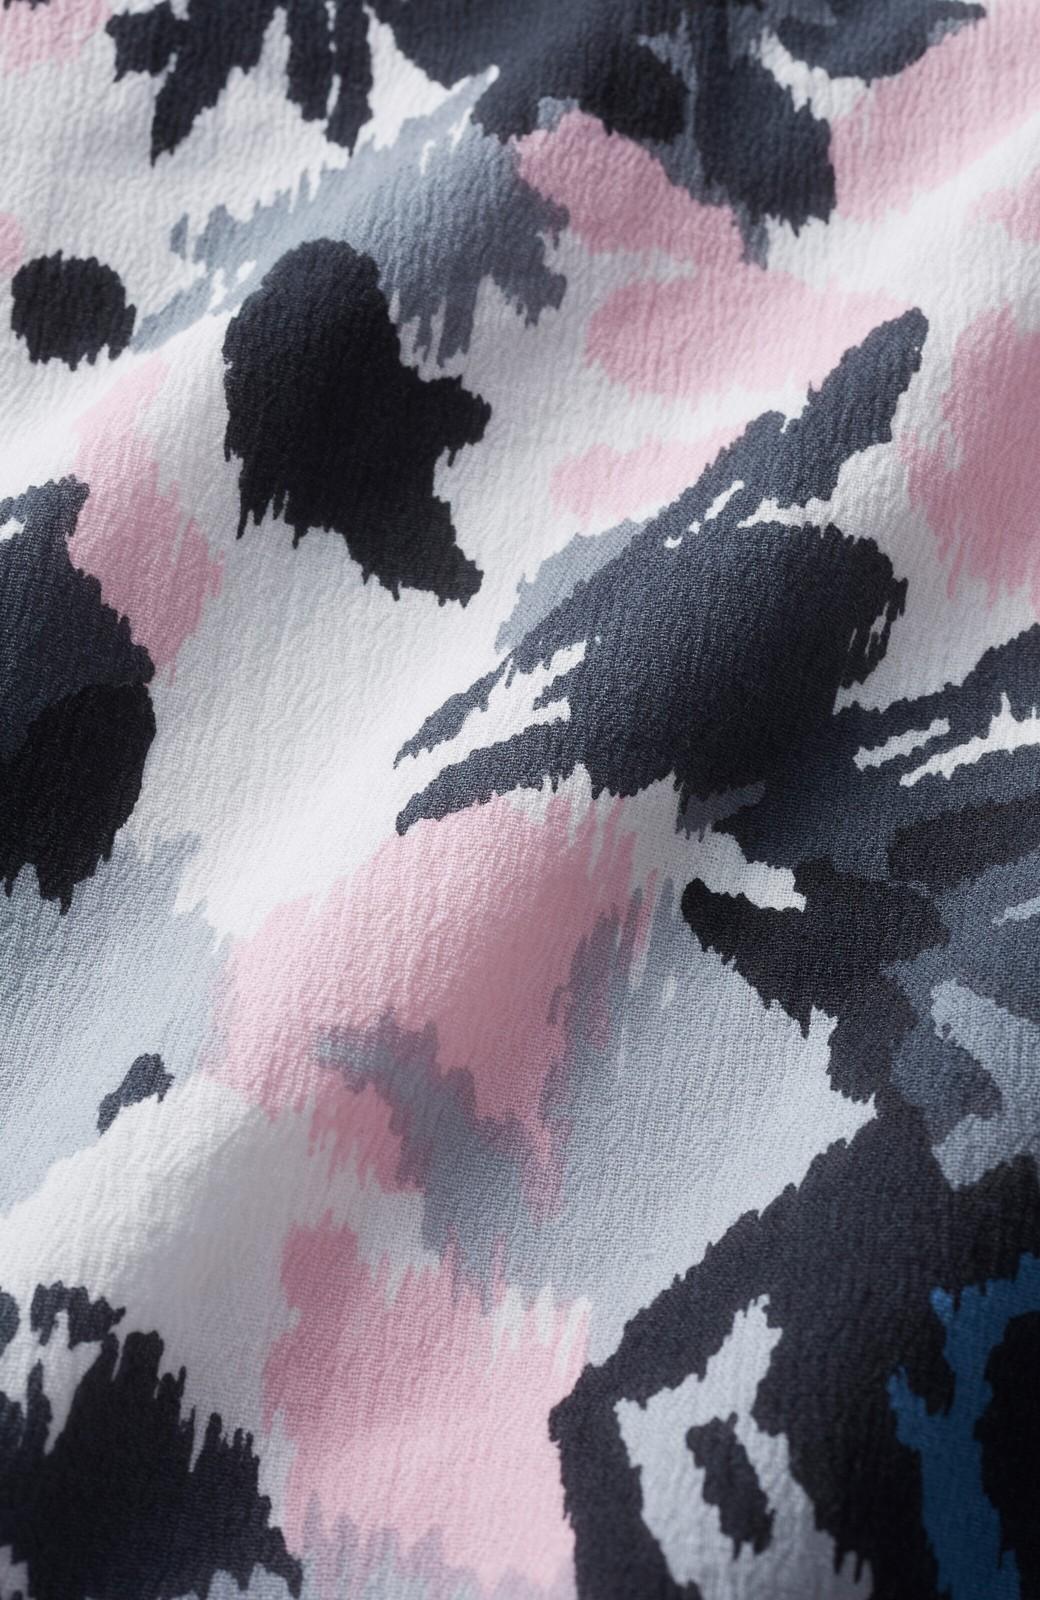 haco! 京都の浴衣屋さんと作った浴衣生地のフレアースリーブブラウス <グレー系その他>の商品写真3